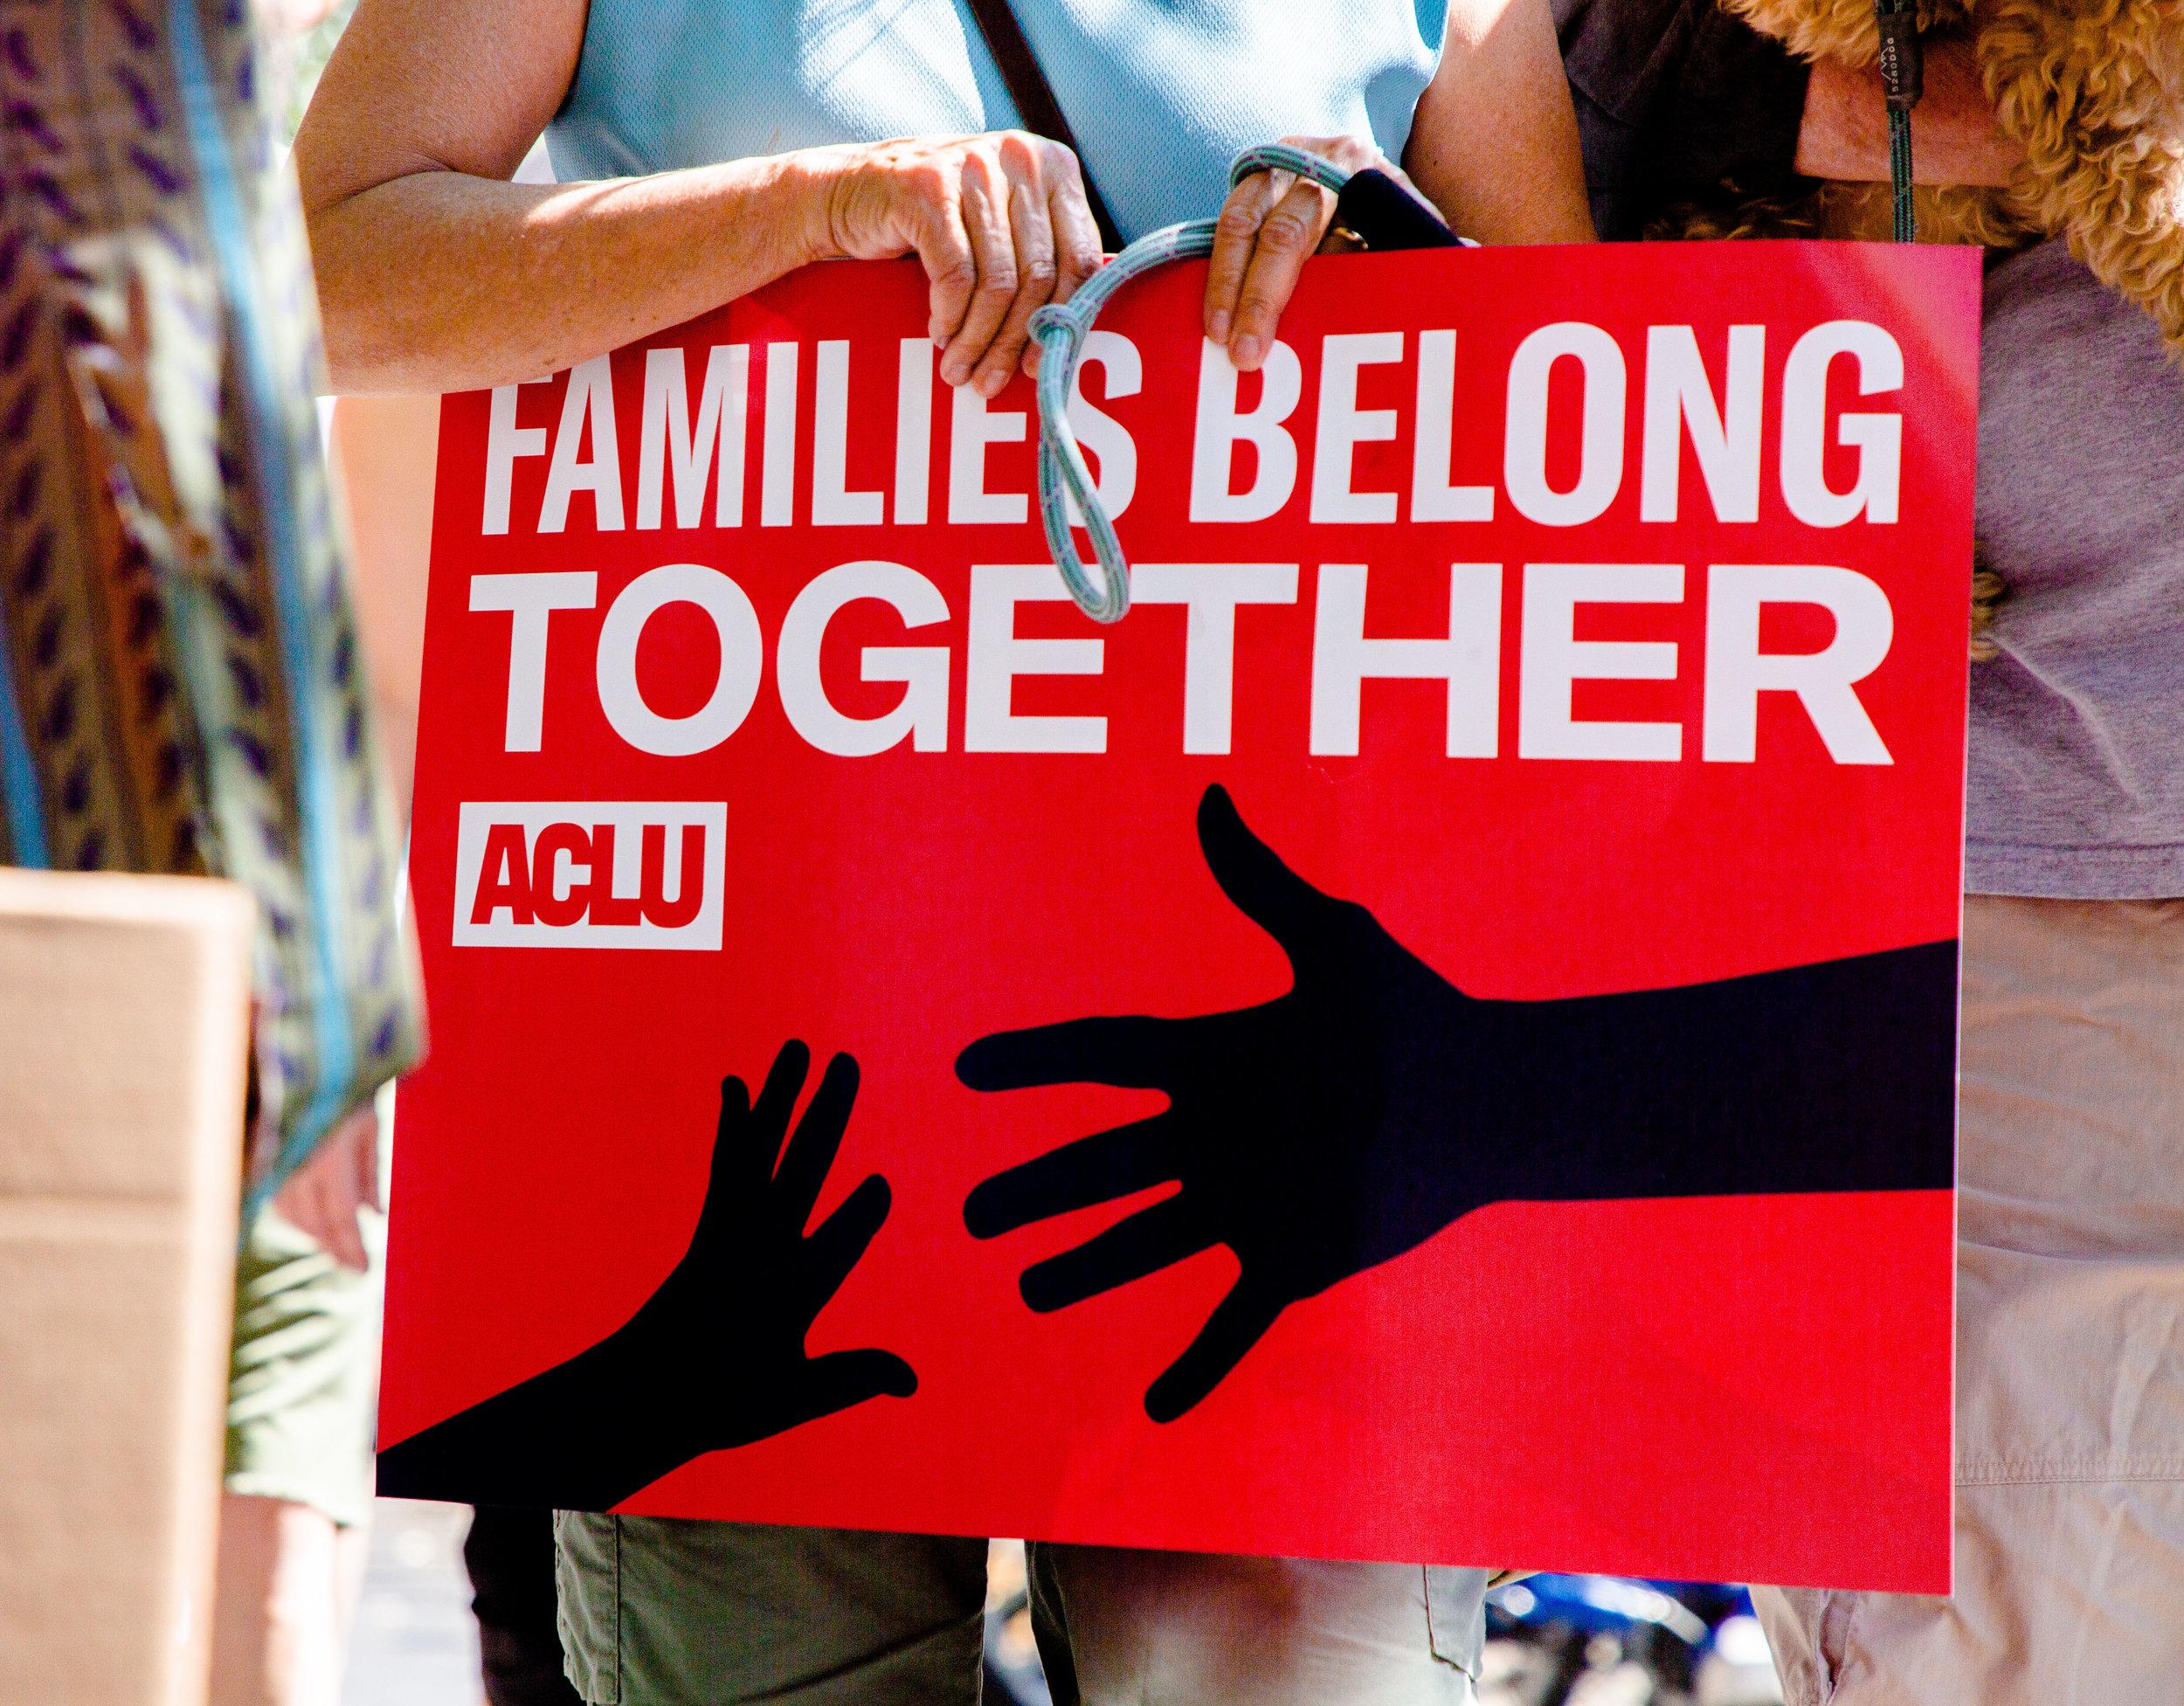 6.30.18_FamiliesBelongTogether_NYCLU-4.jpg